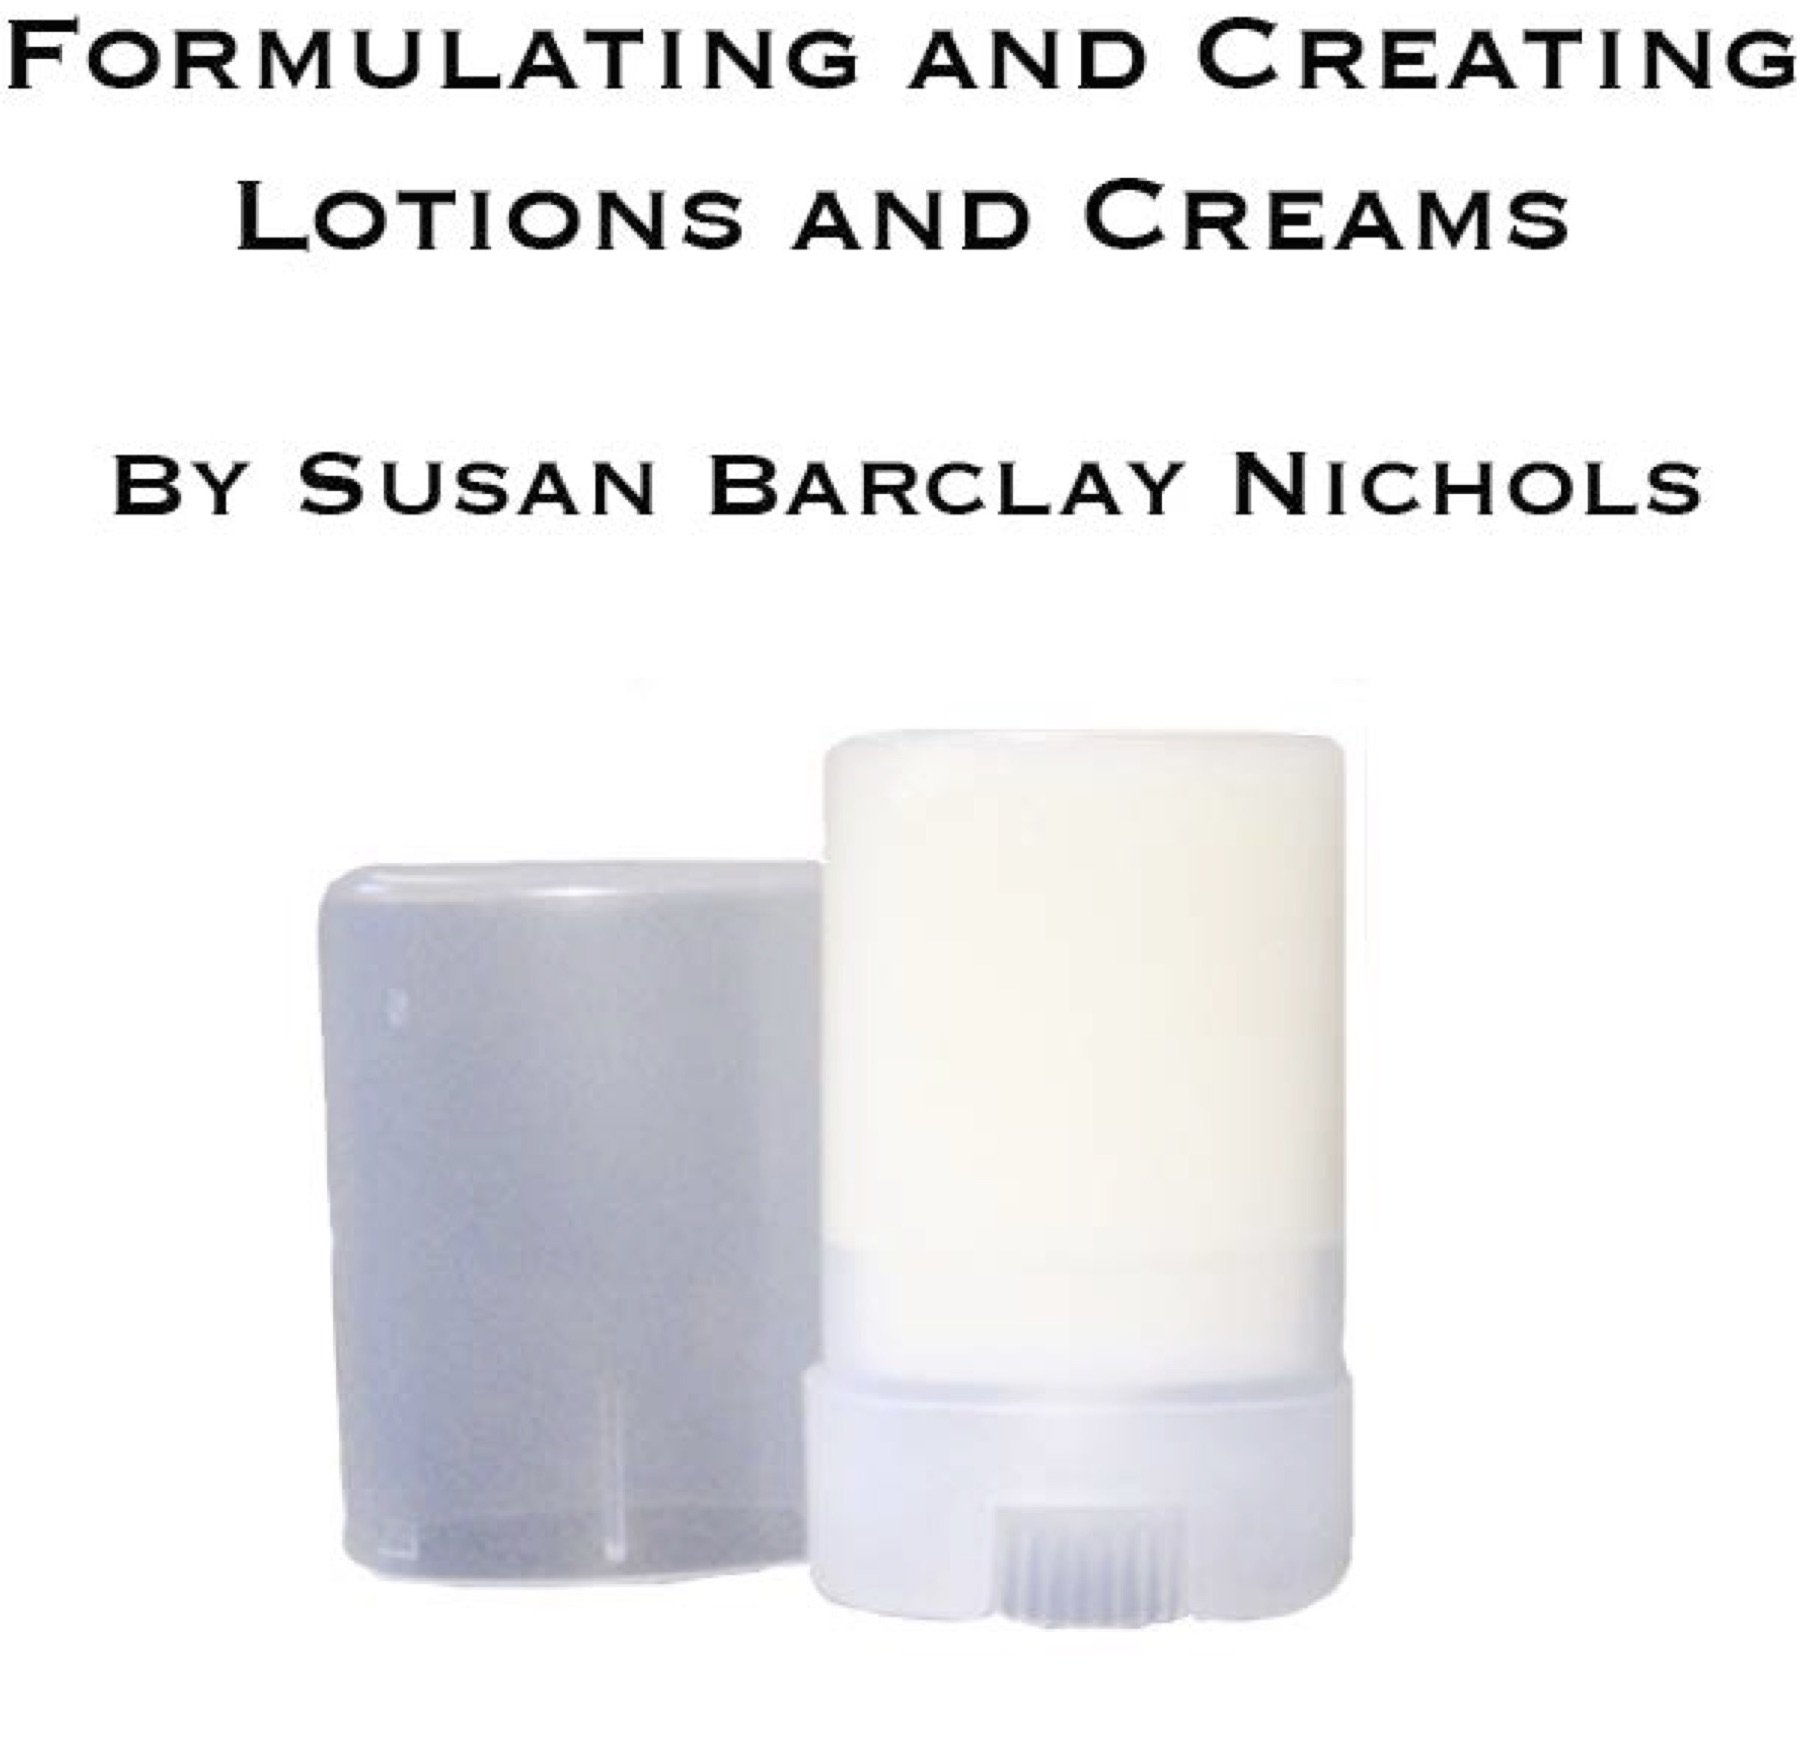 Formulating Lotions & Creams